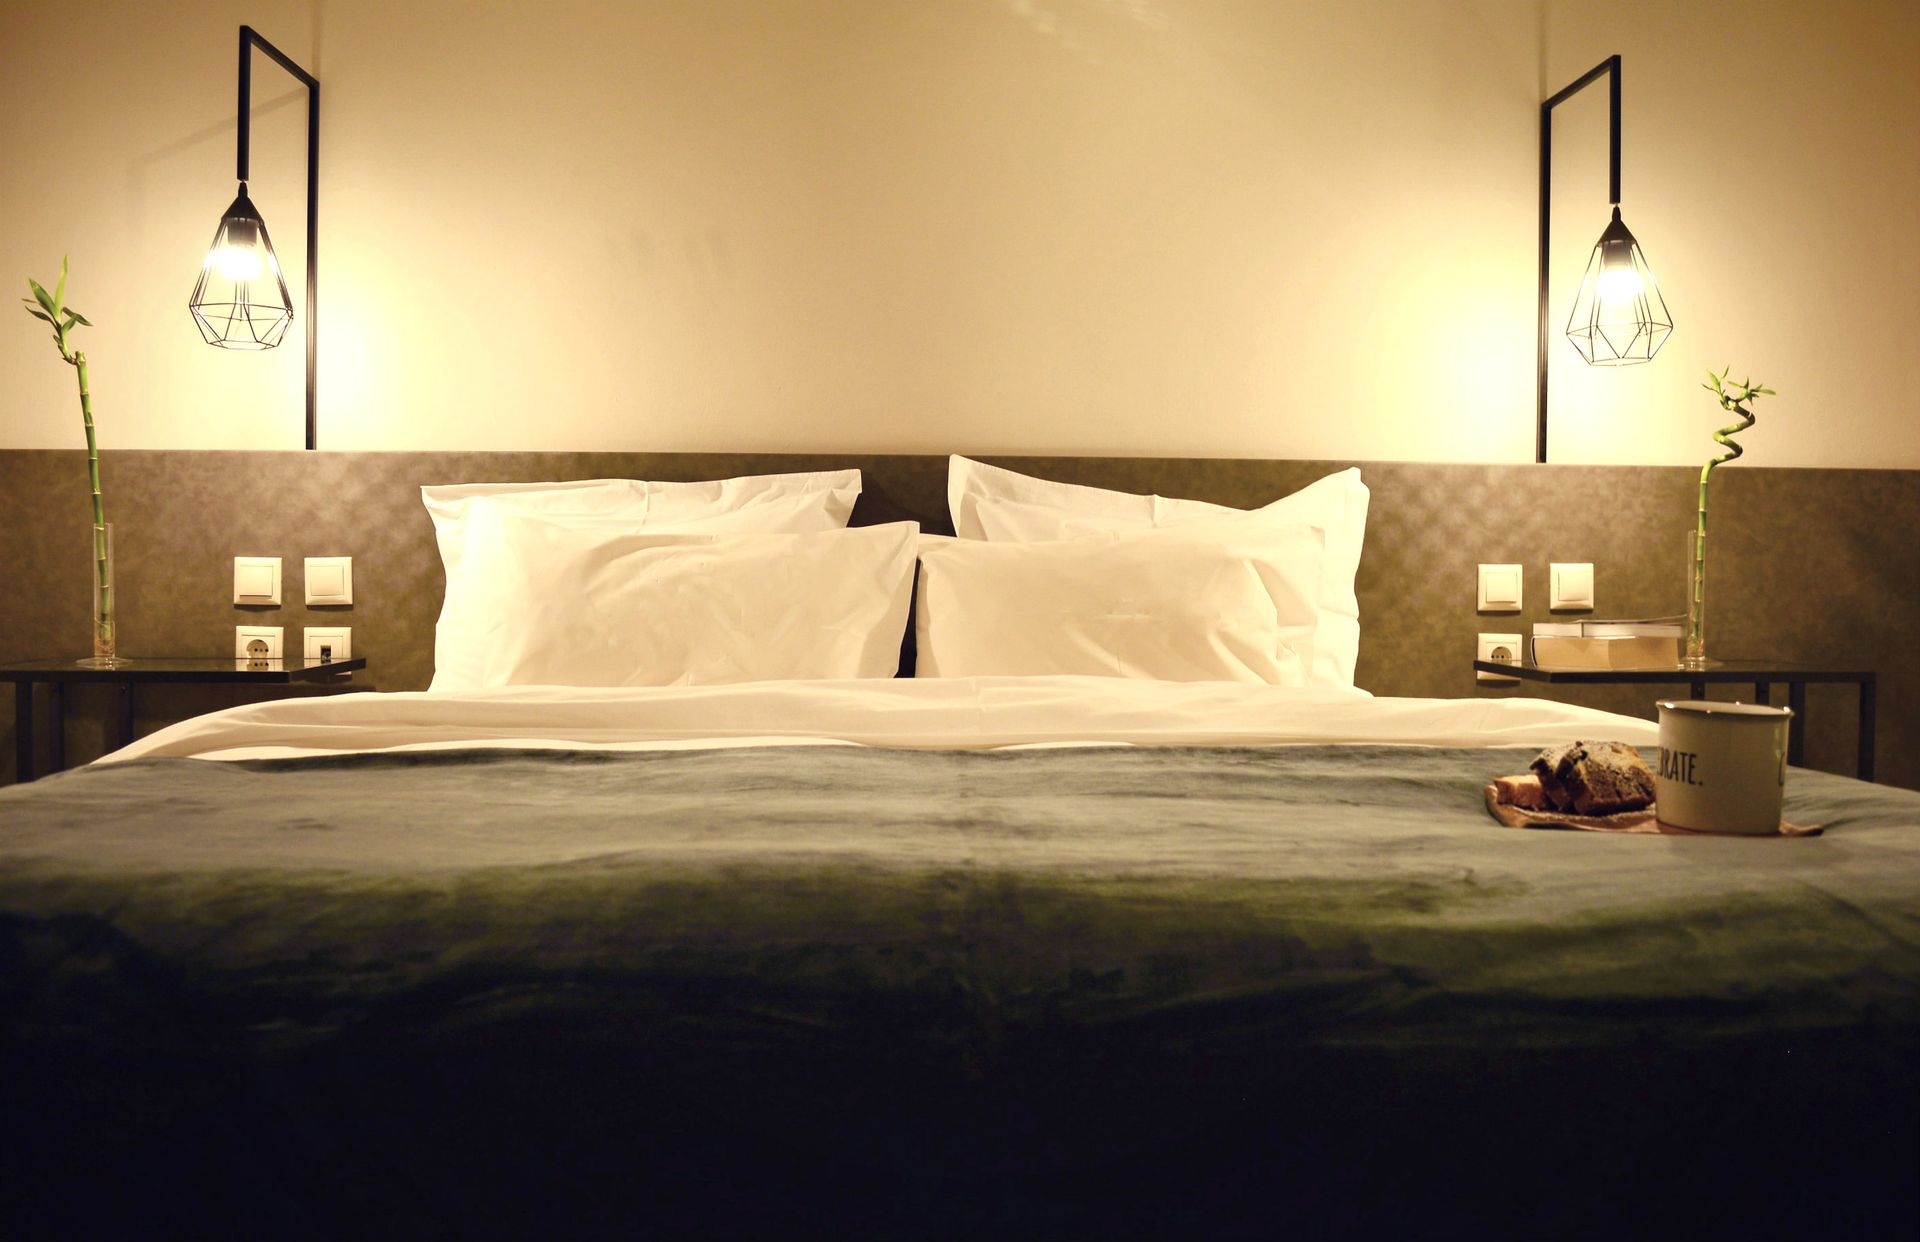 Alexakis Hotel - Λουτρά Υπάτης εικόνα